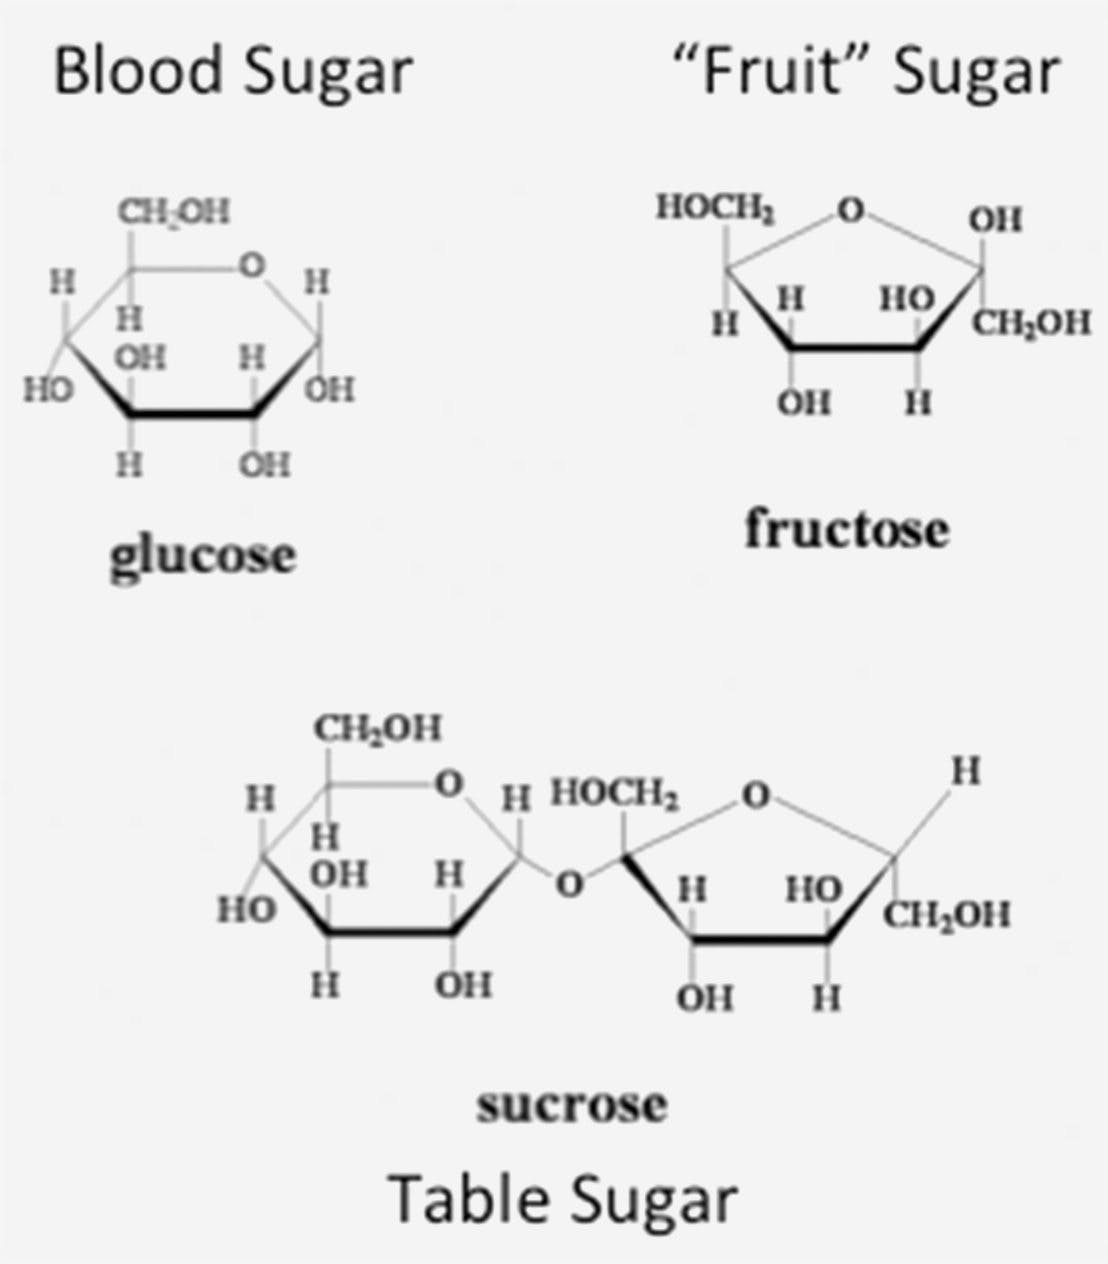 gluc-and-fruc